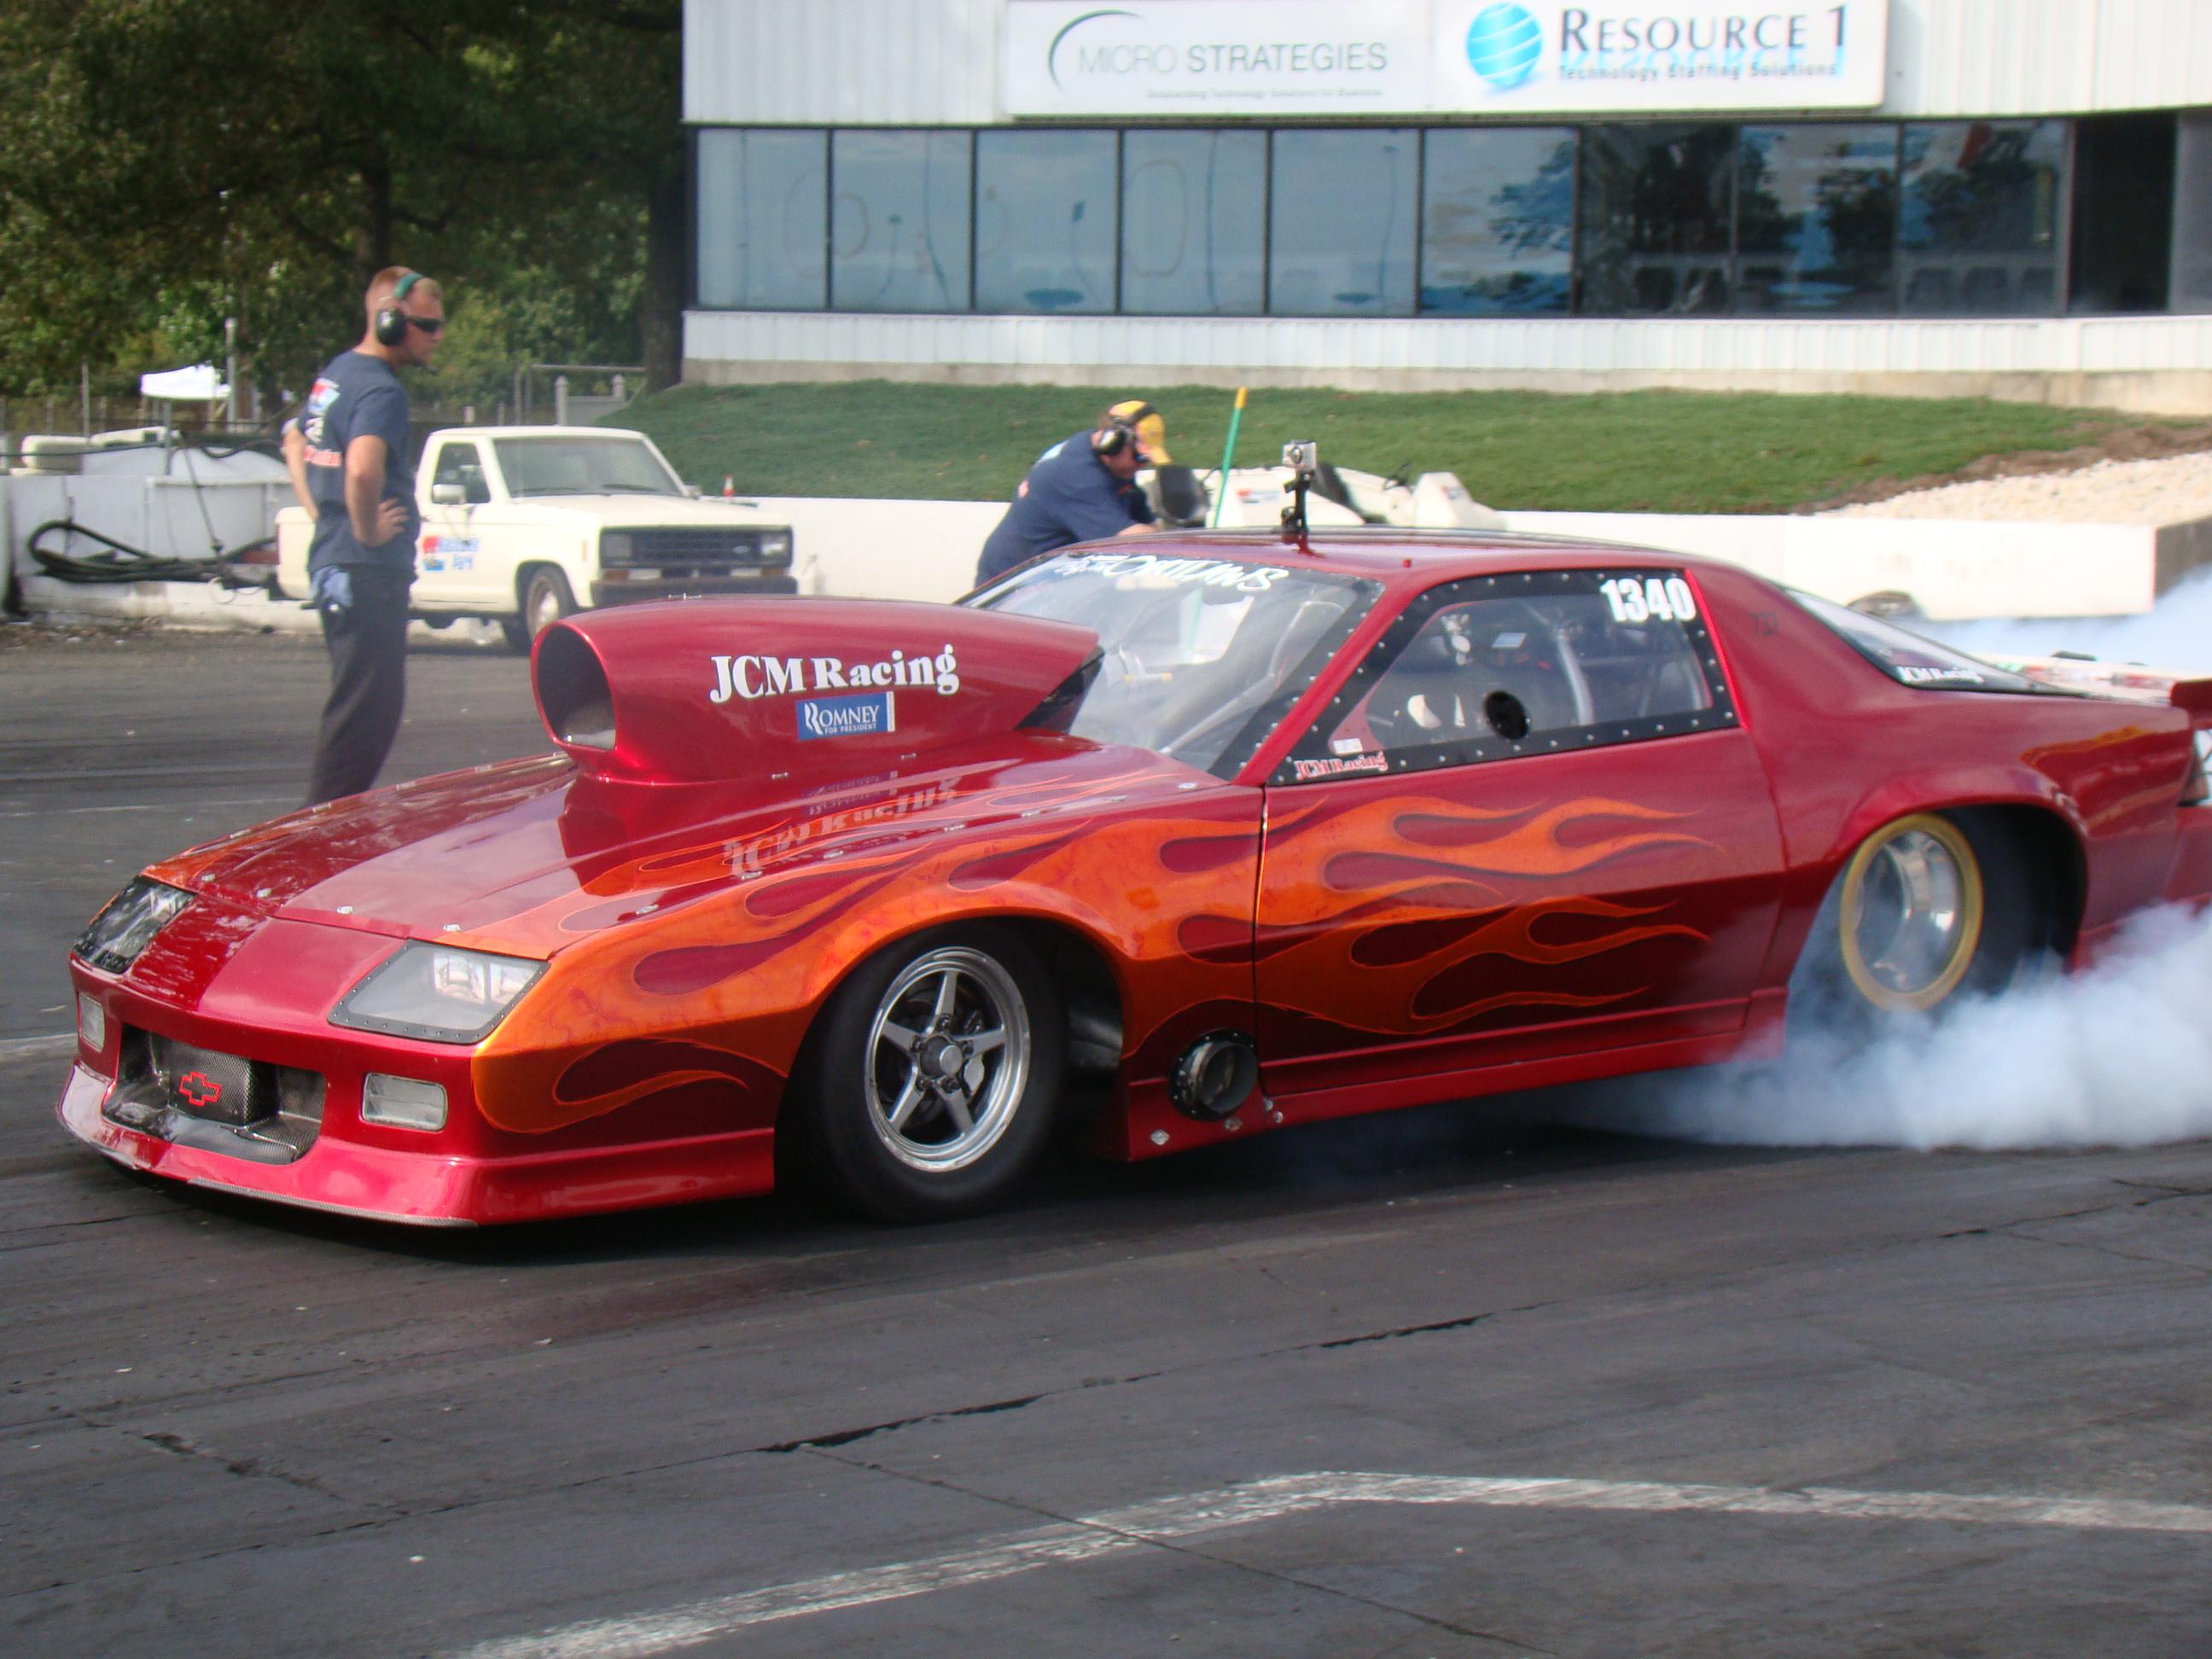 Drag race car paint schemes - Driver John Cerbone In Drag Racing